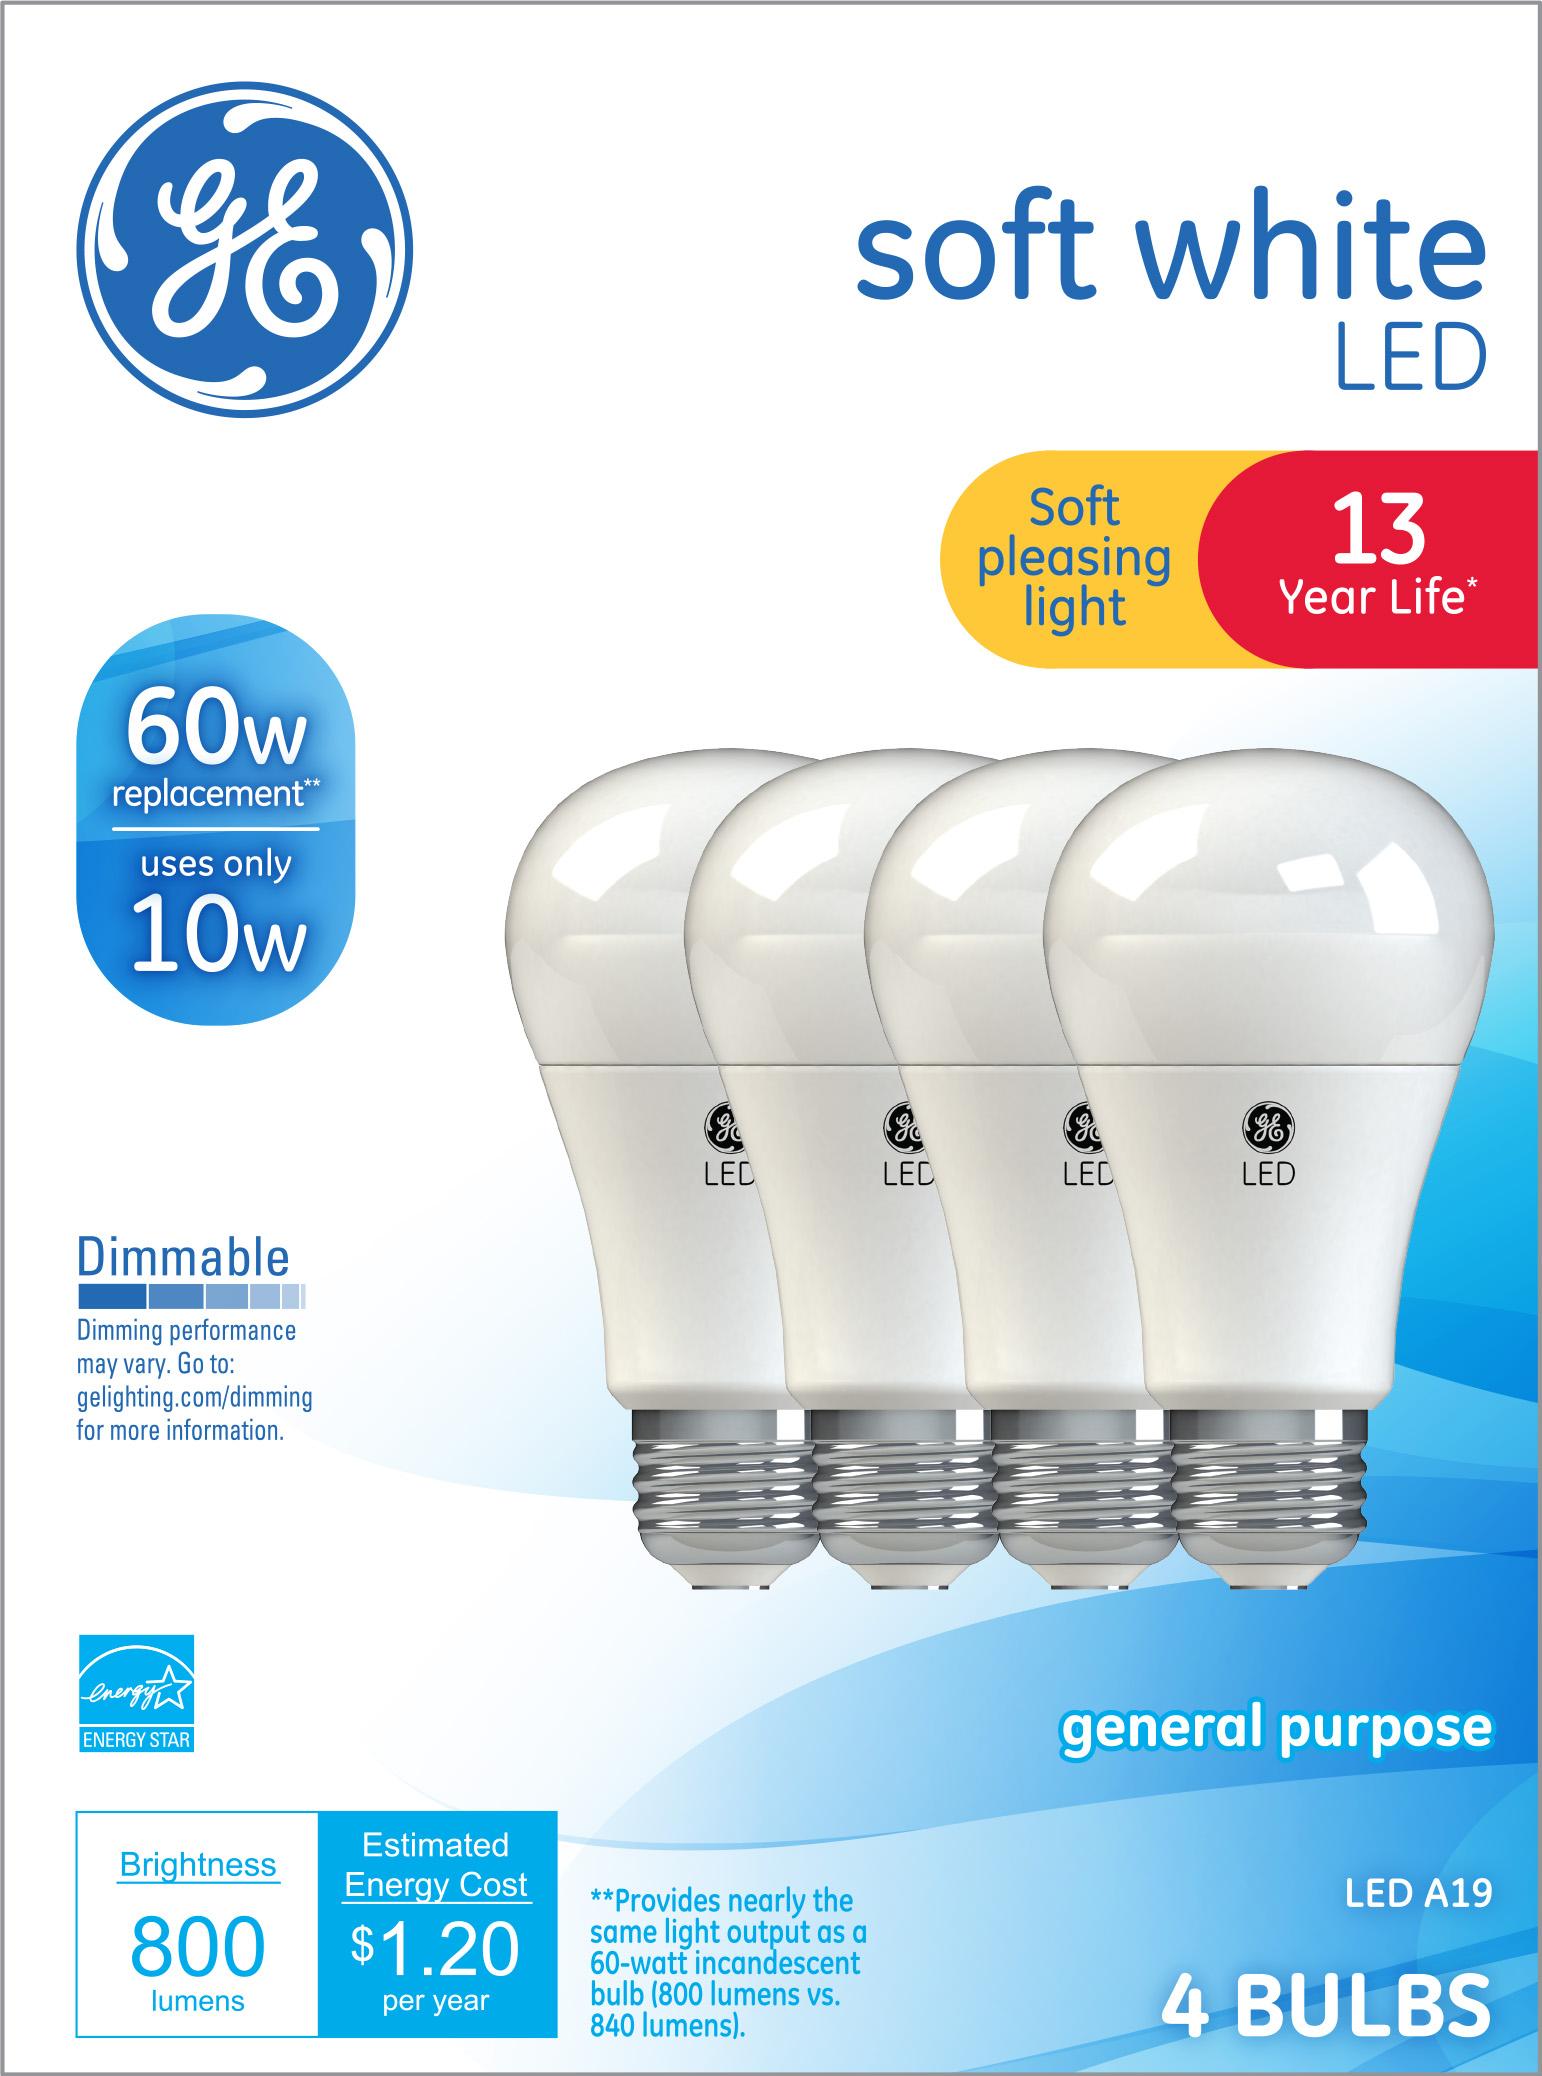 GE LED 10W (60W Equivalent) Soft White $0.97